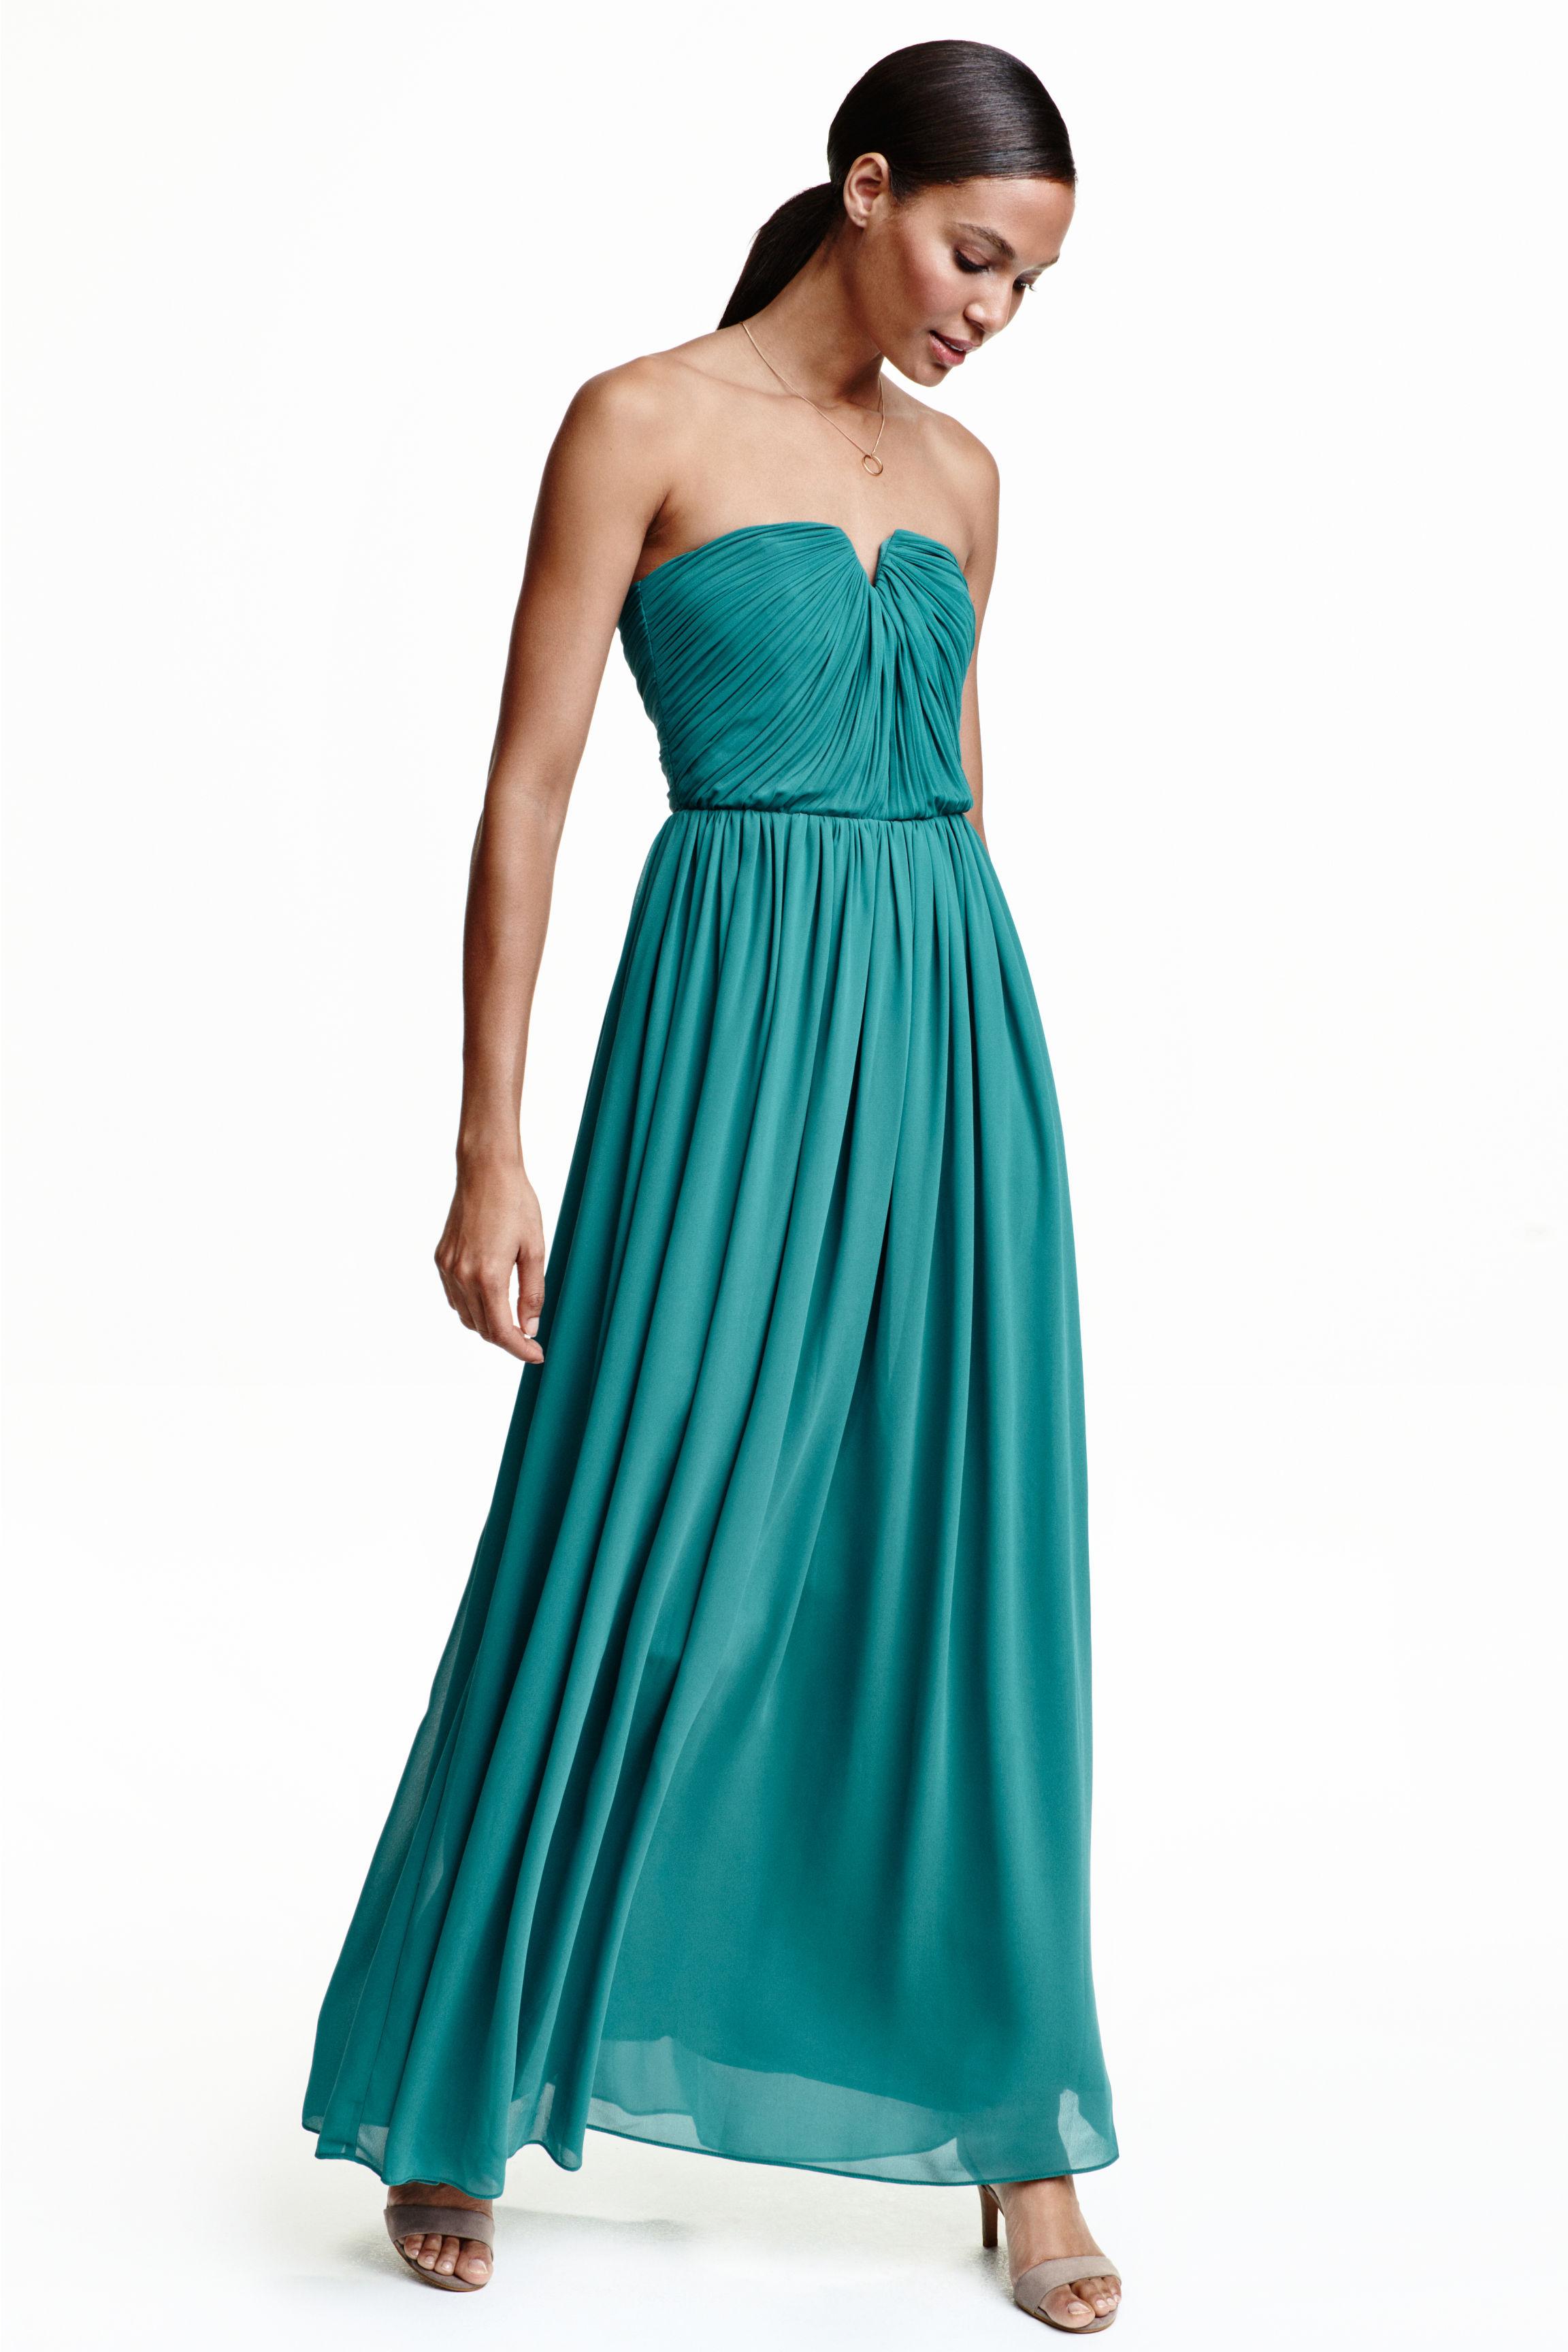 Wedding guest dresses under £50! - Love Our Wedding